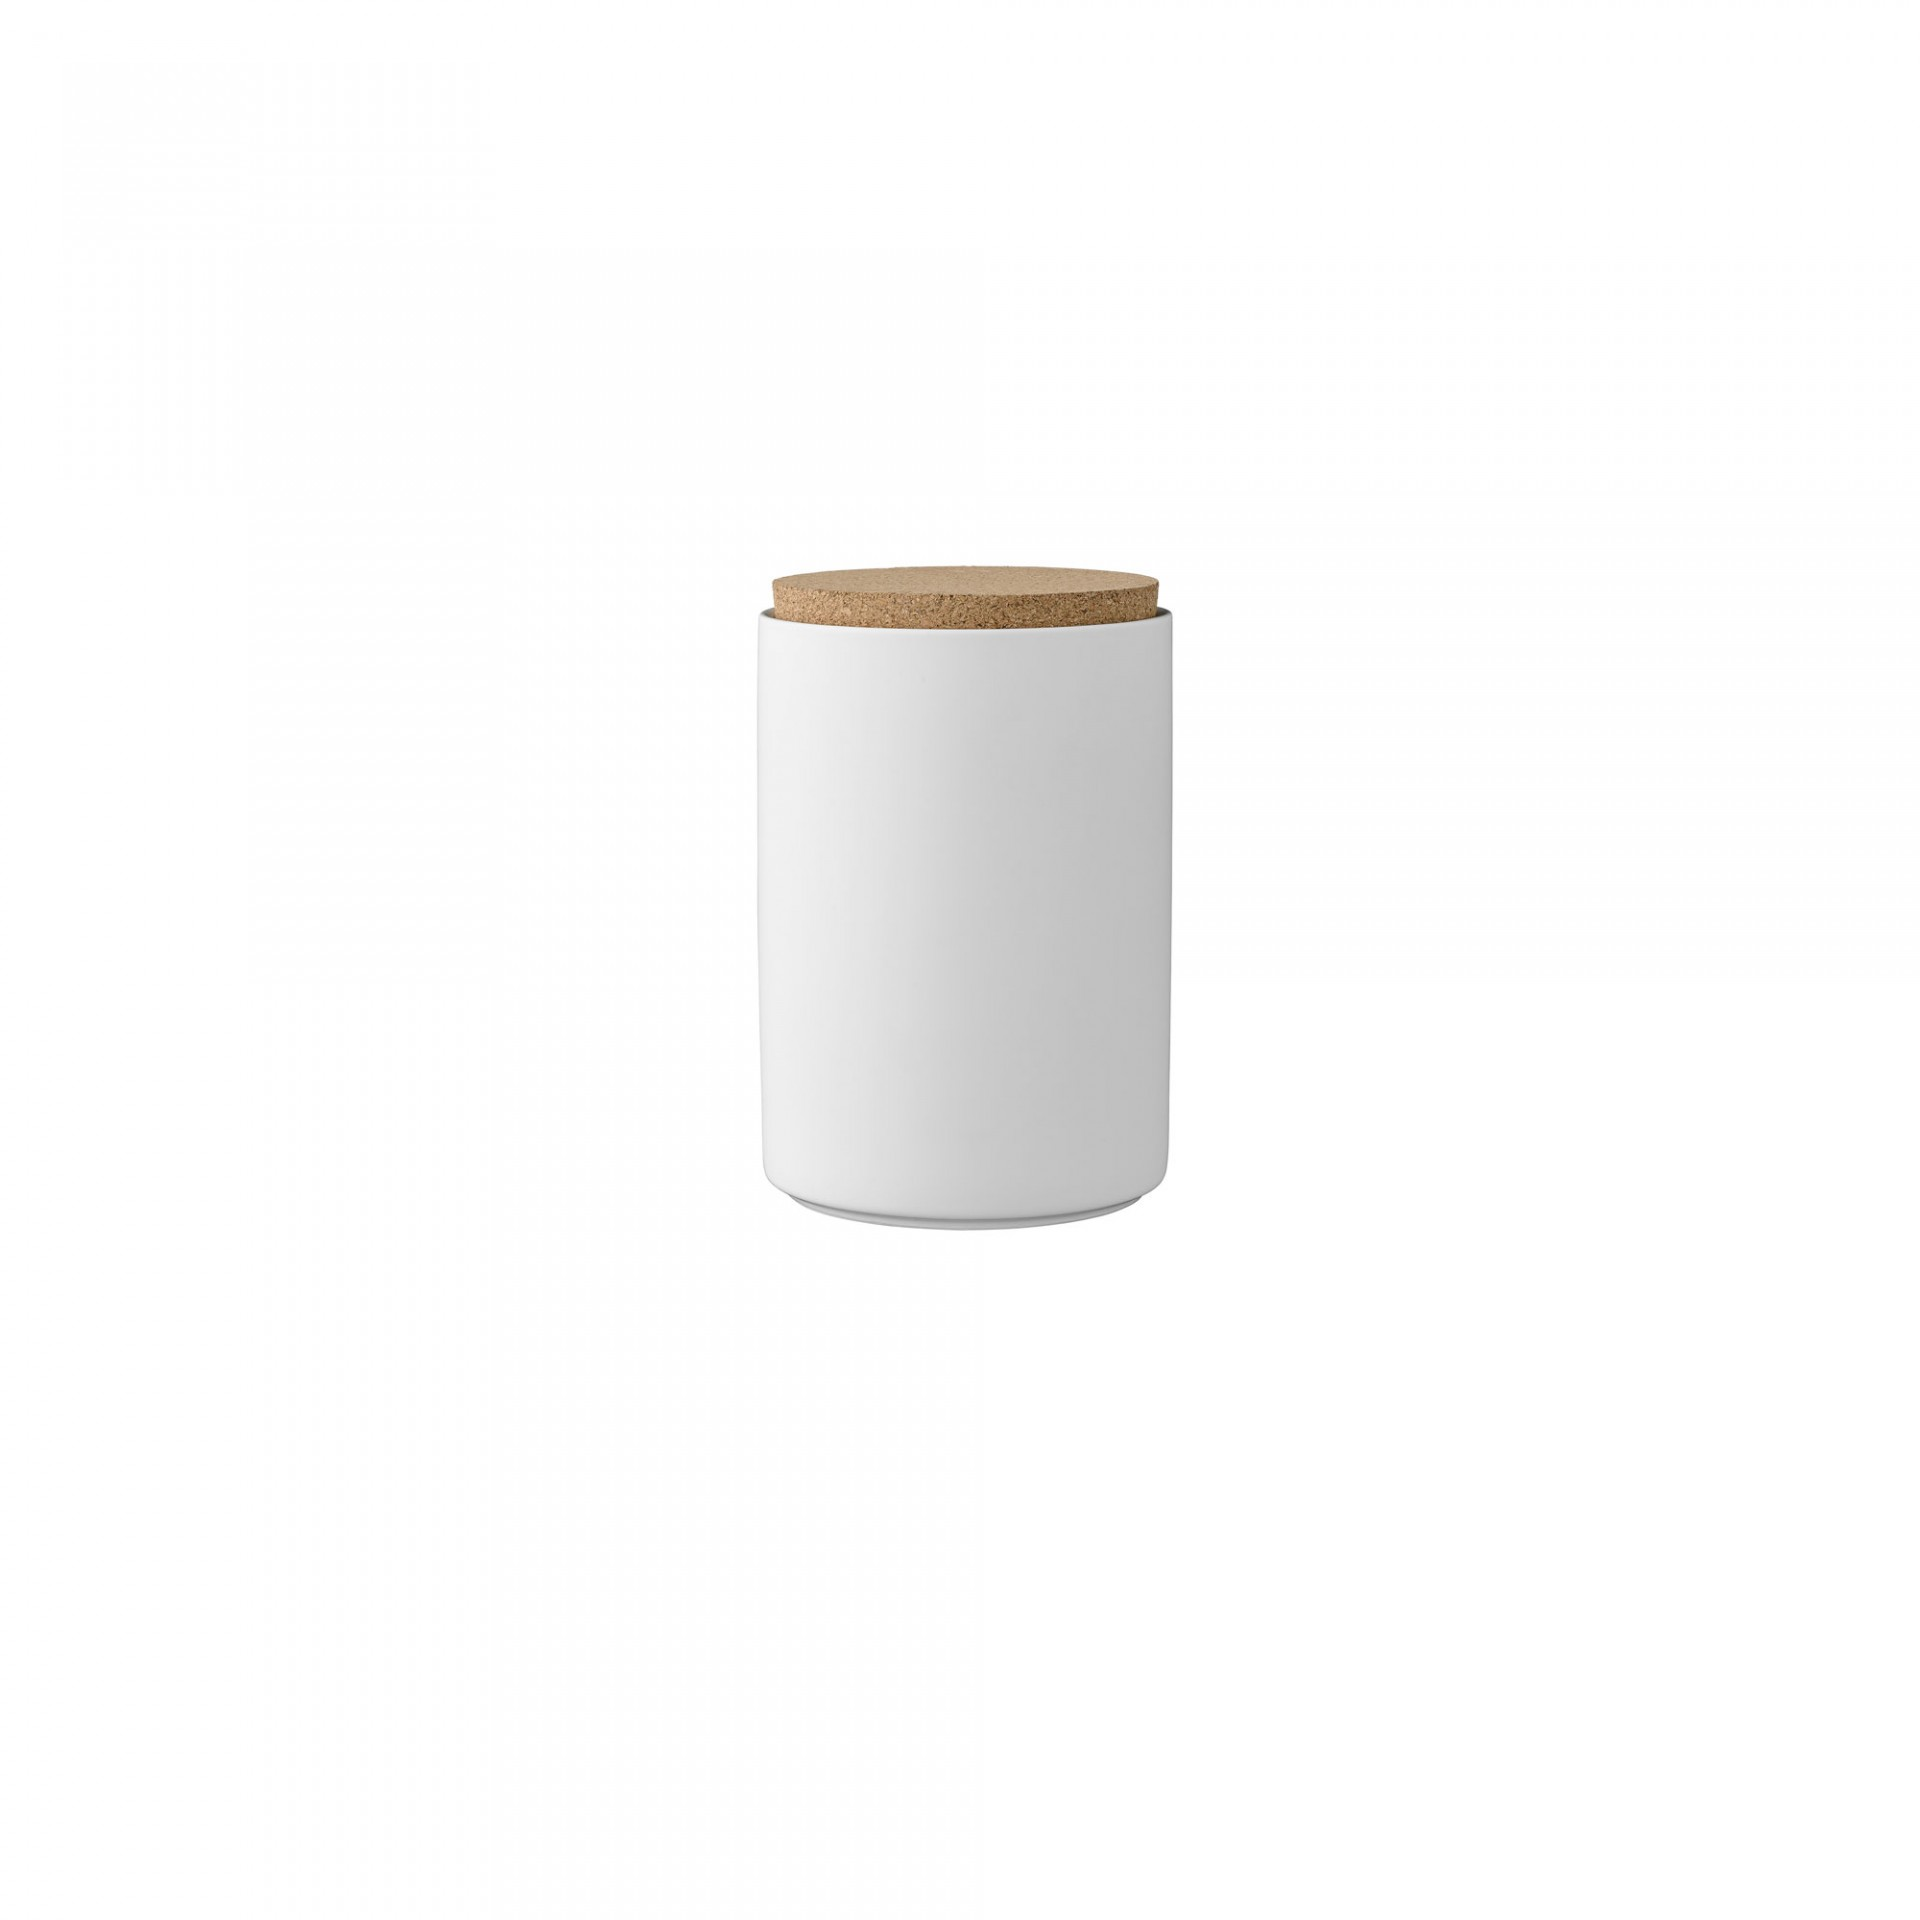 Pote em porcelana c/tampa de cortiça, branco, Ø11x16